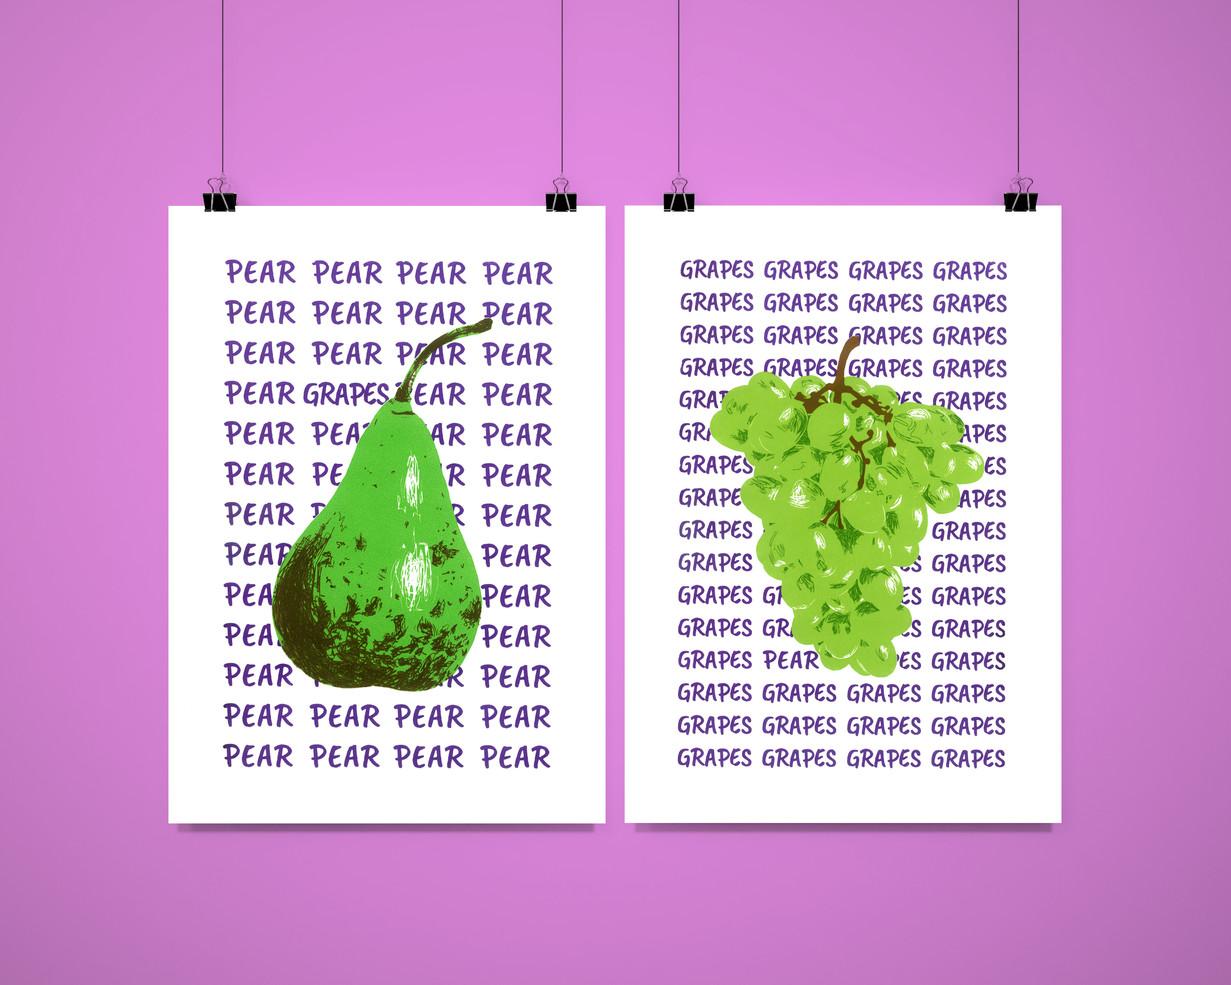 pear grapes mounted.jpg